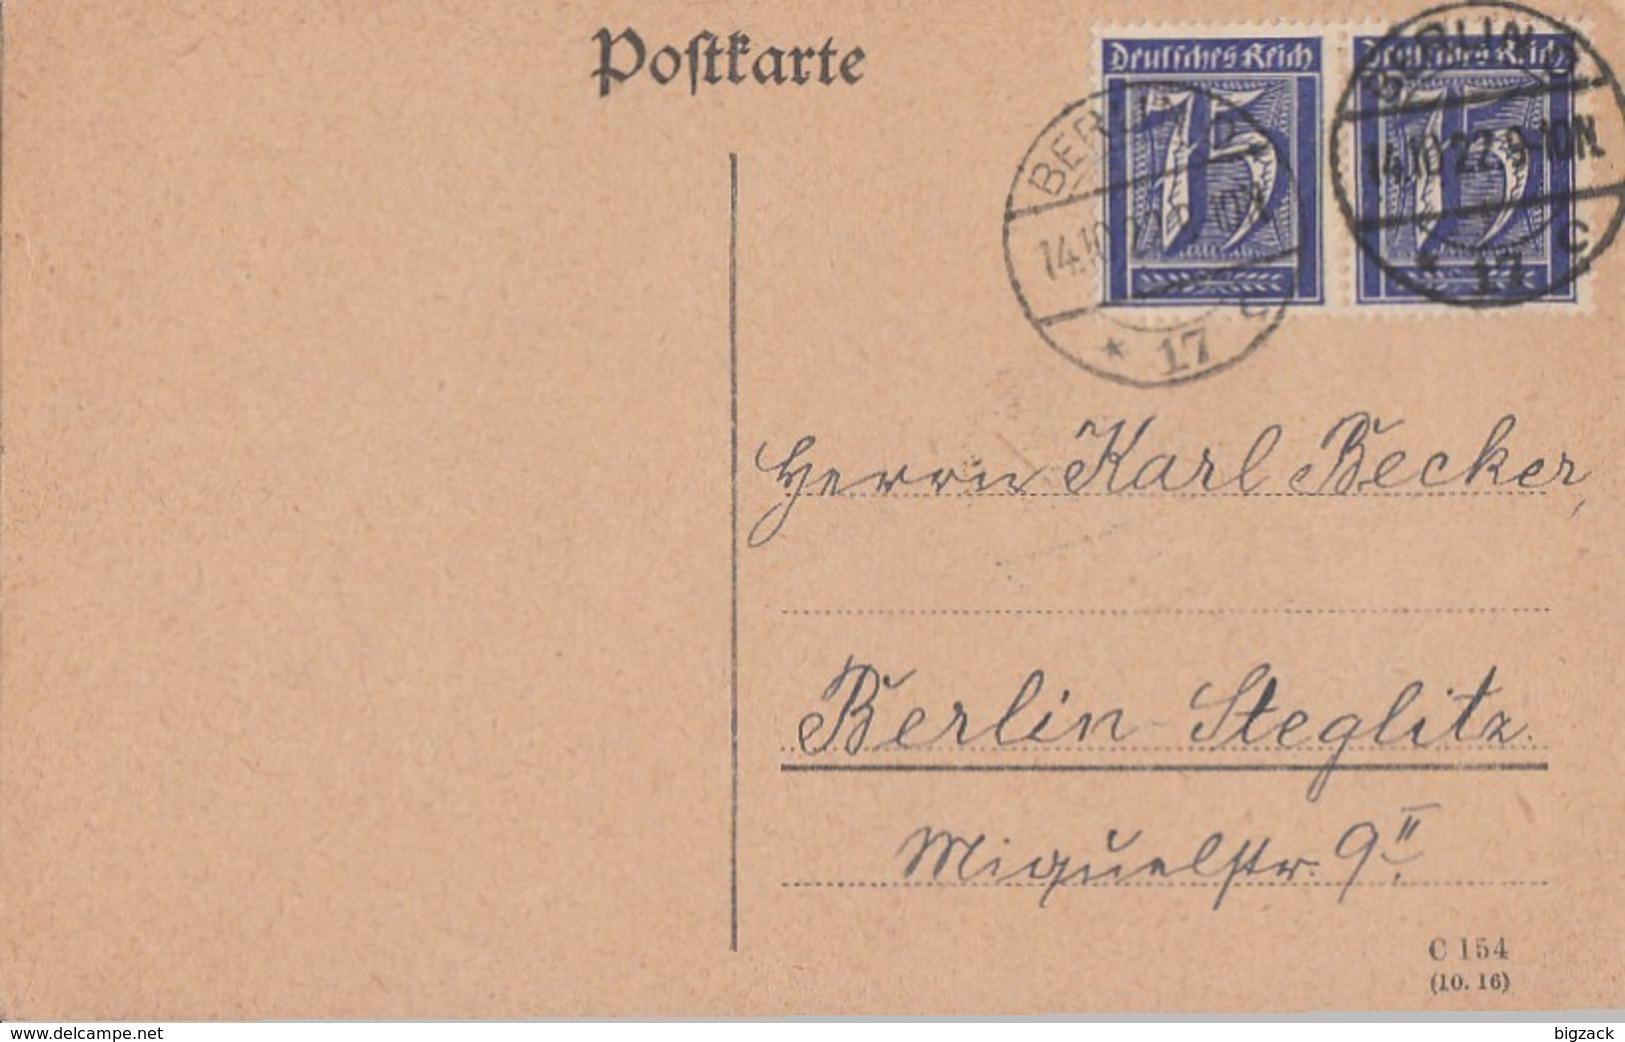 DR Ortskarte Mef Minr.2x 185 Berlin 14.10.22 - Briefe U. Dokumente